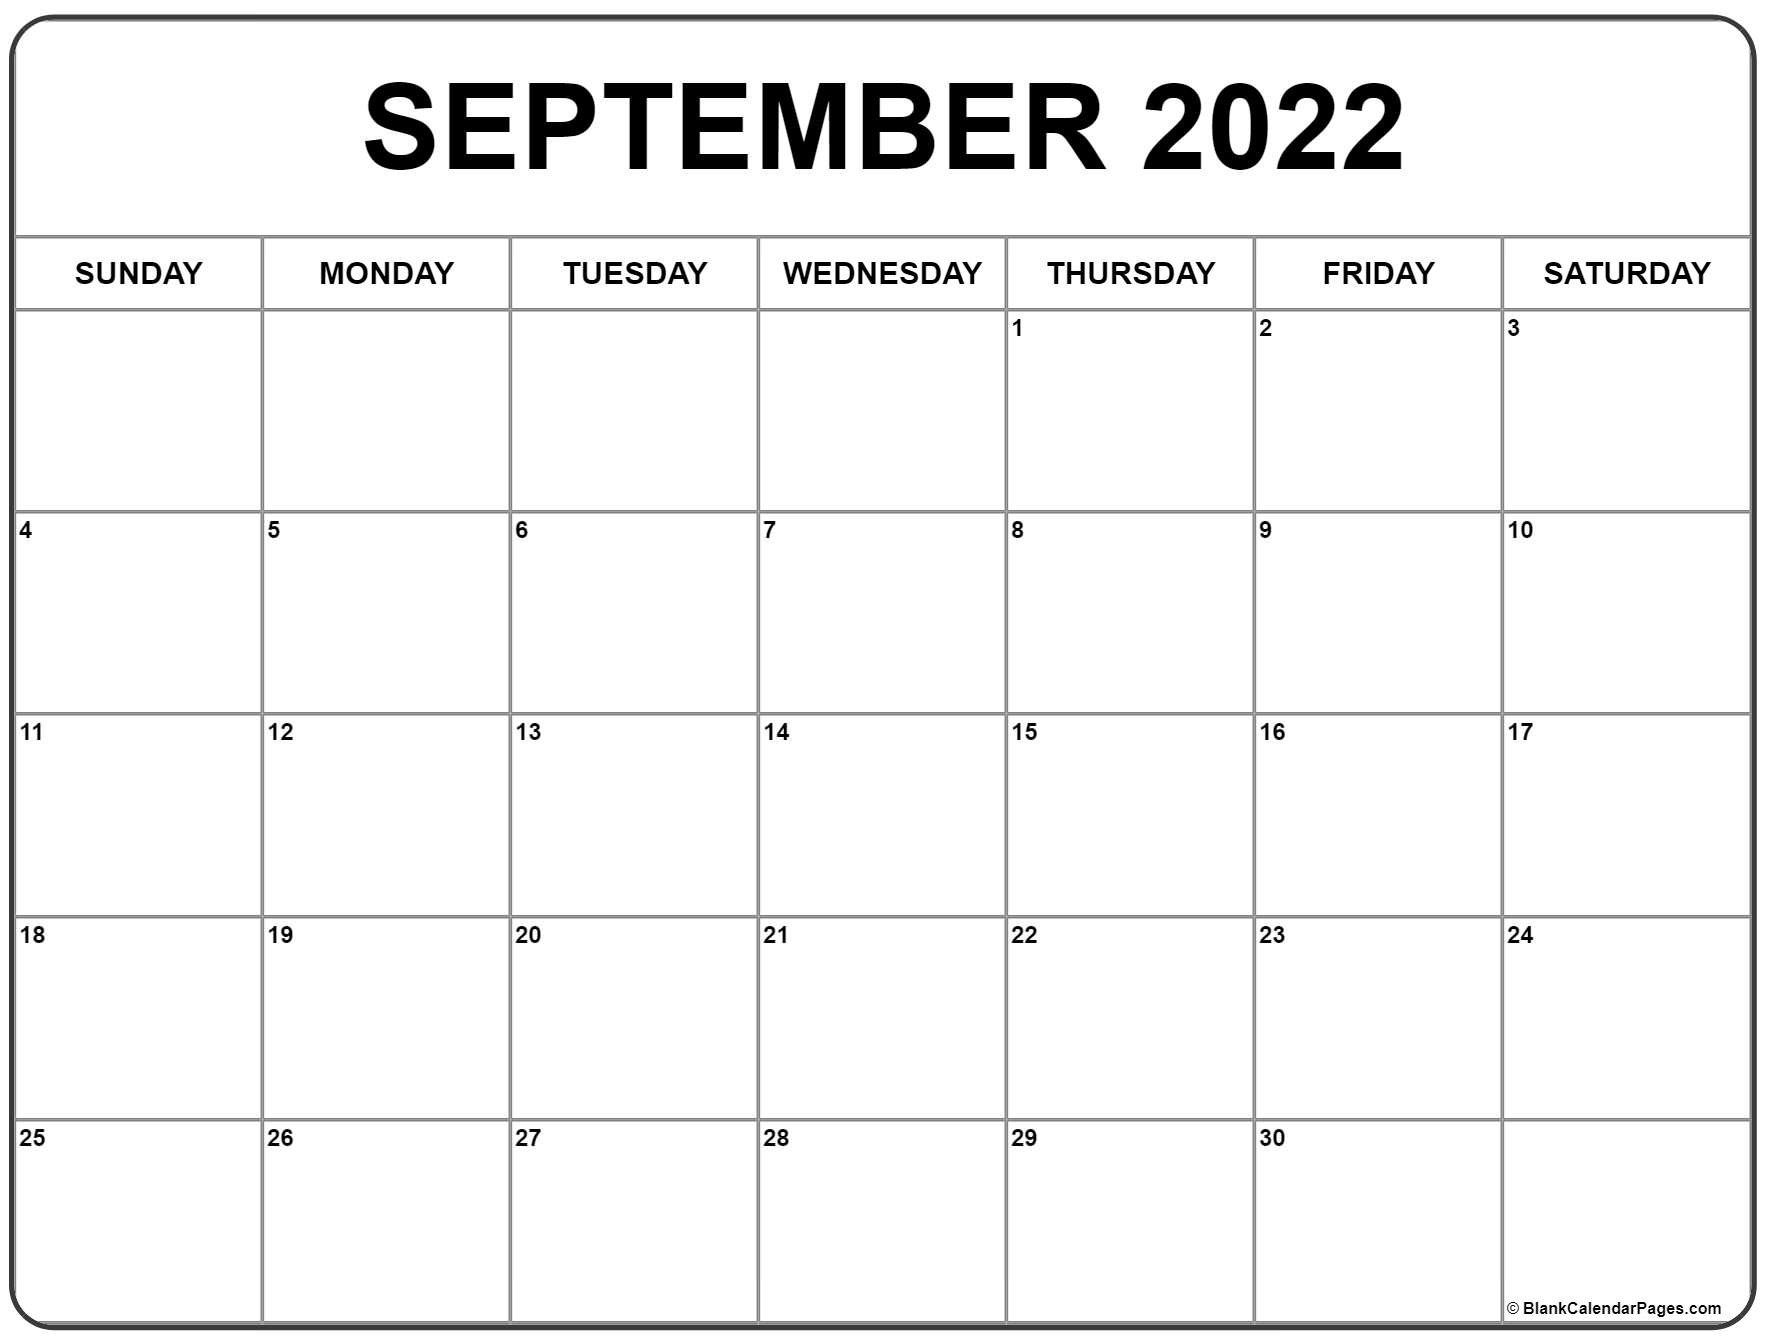 September 2022 Calendar | Free Printable Calendar Templates with regard to Monthly Calendar September 2022